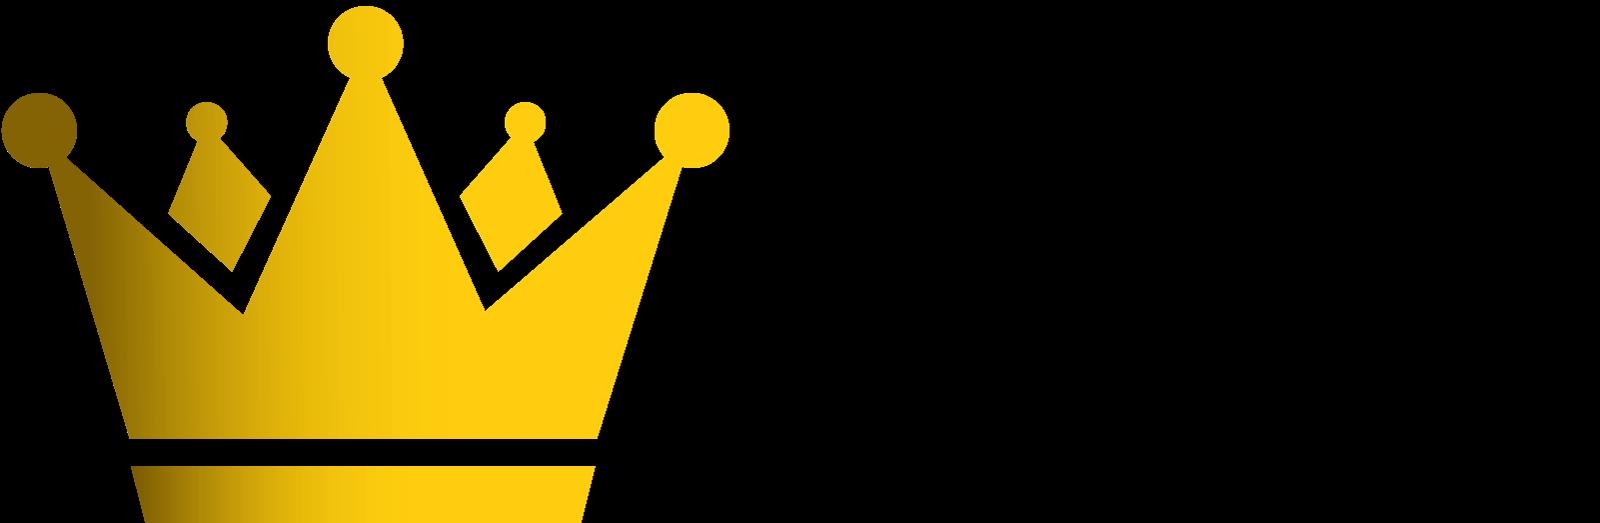 Svenska Marinvaror logo